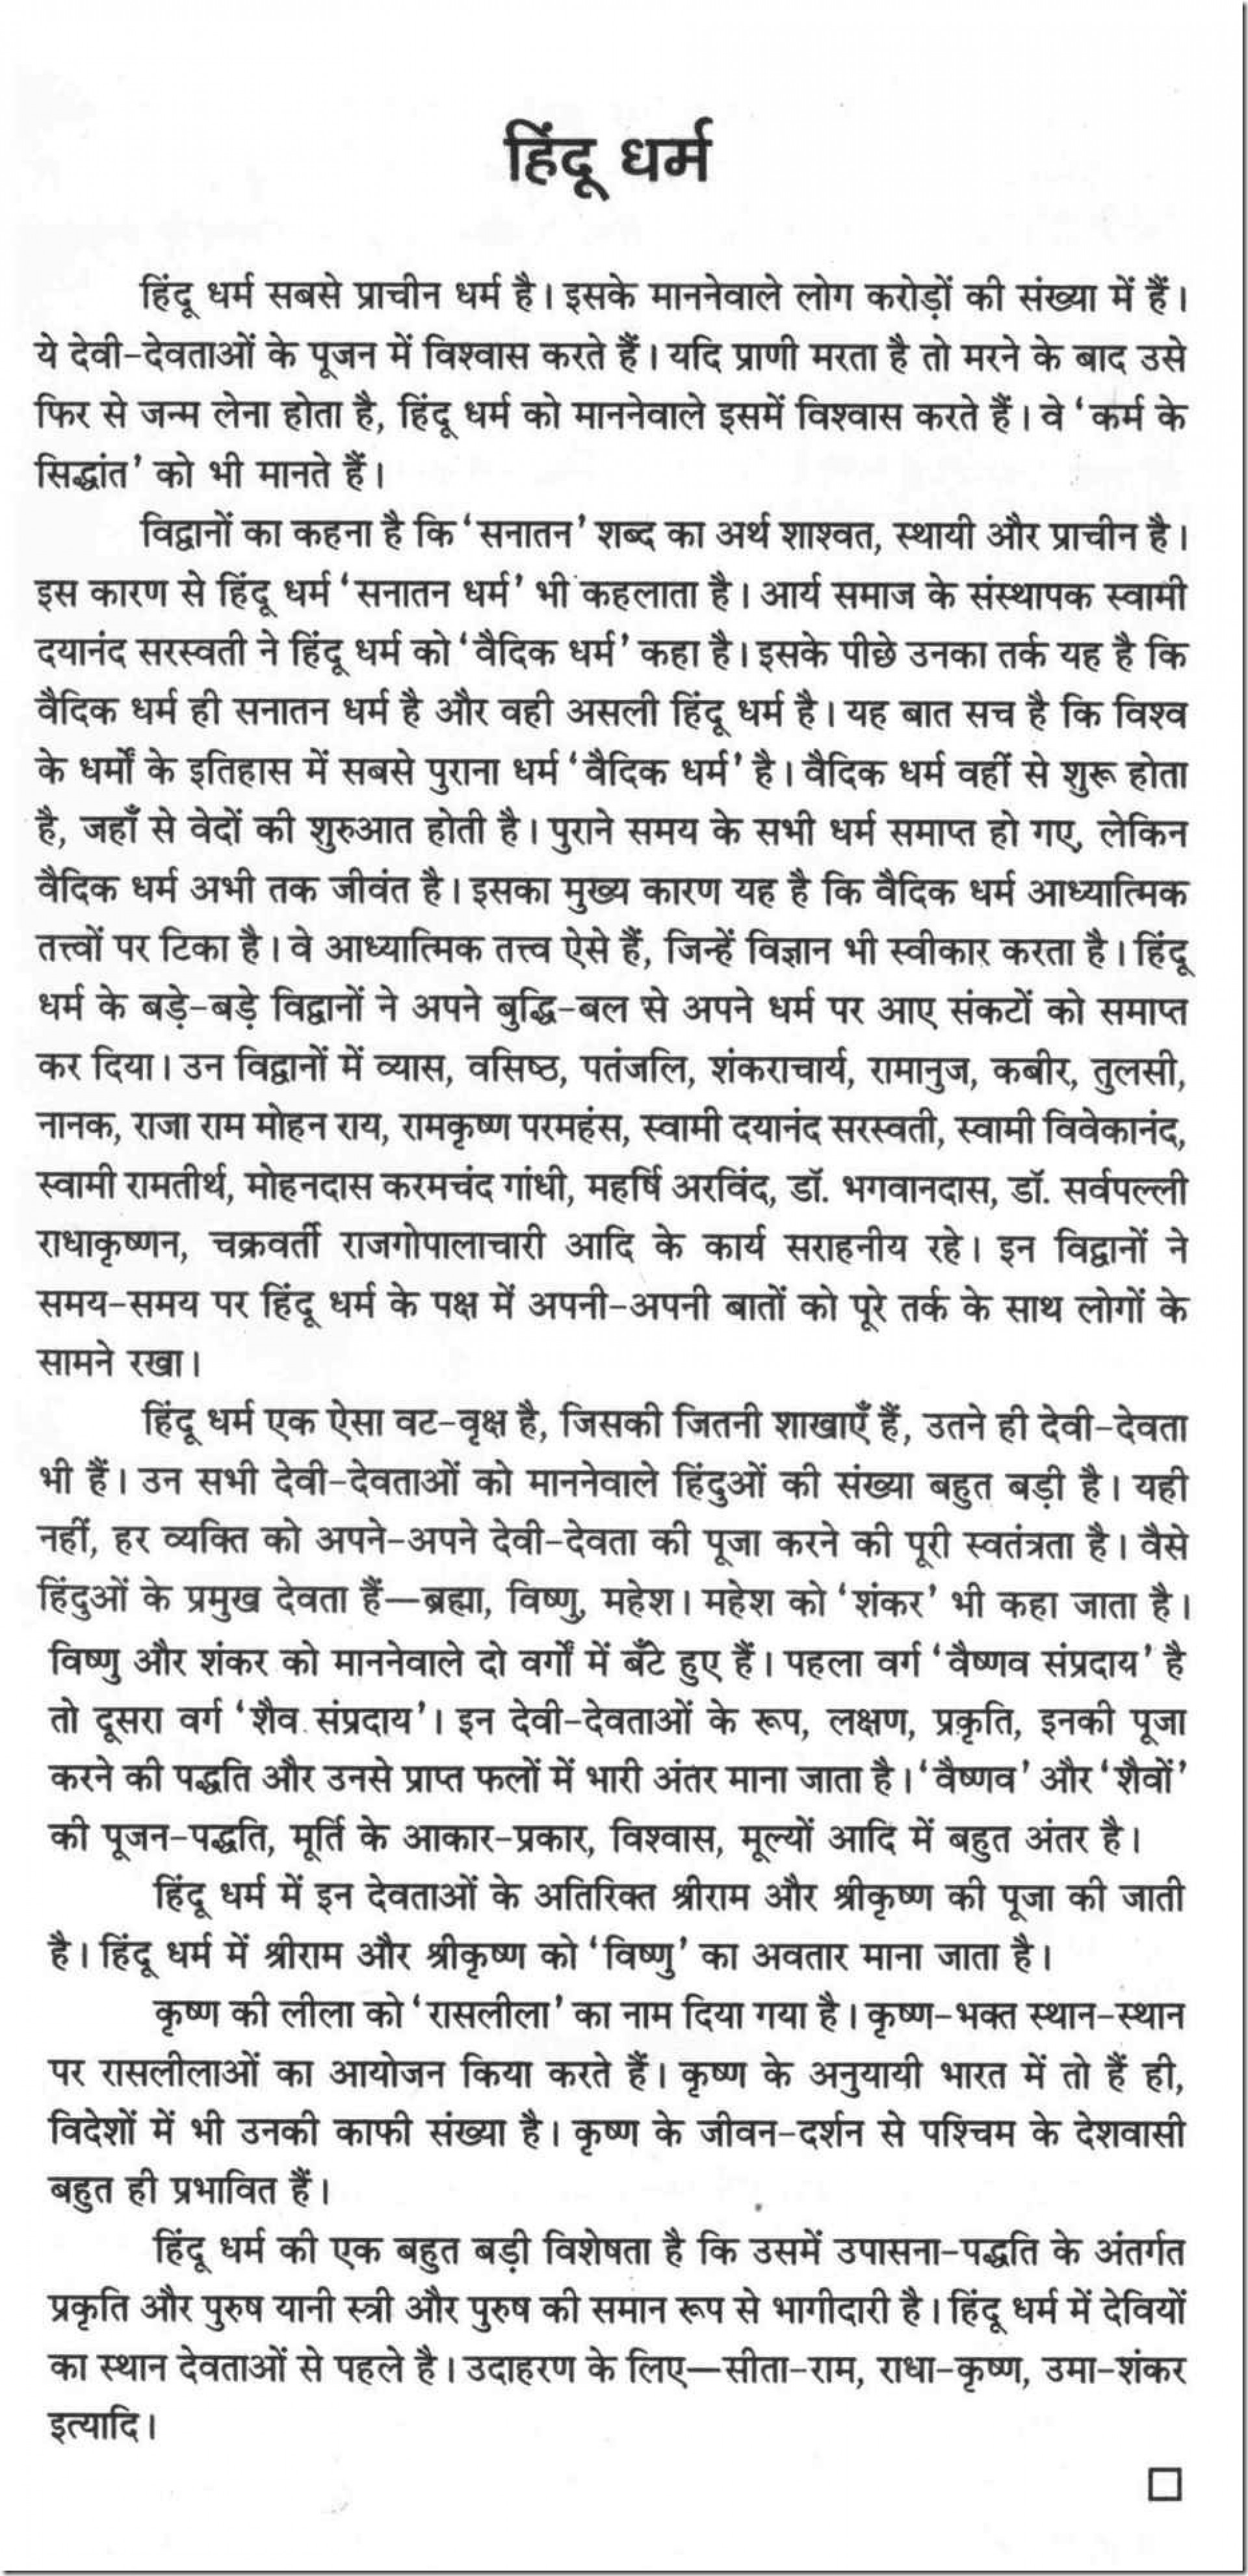 003 Hinduism Essay 10044 Thumb Surprising Questions Hindu Muslim Ekta In Hindi And Buddhism Introduction 1920